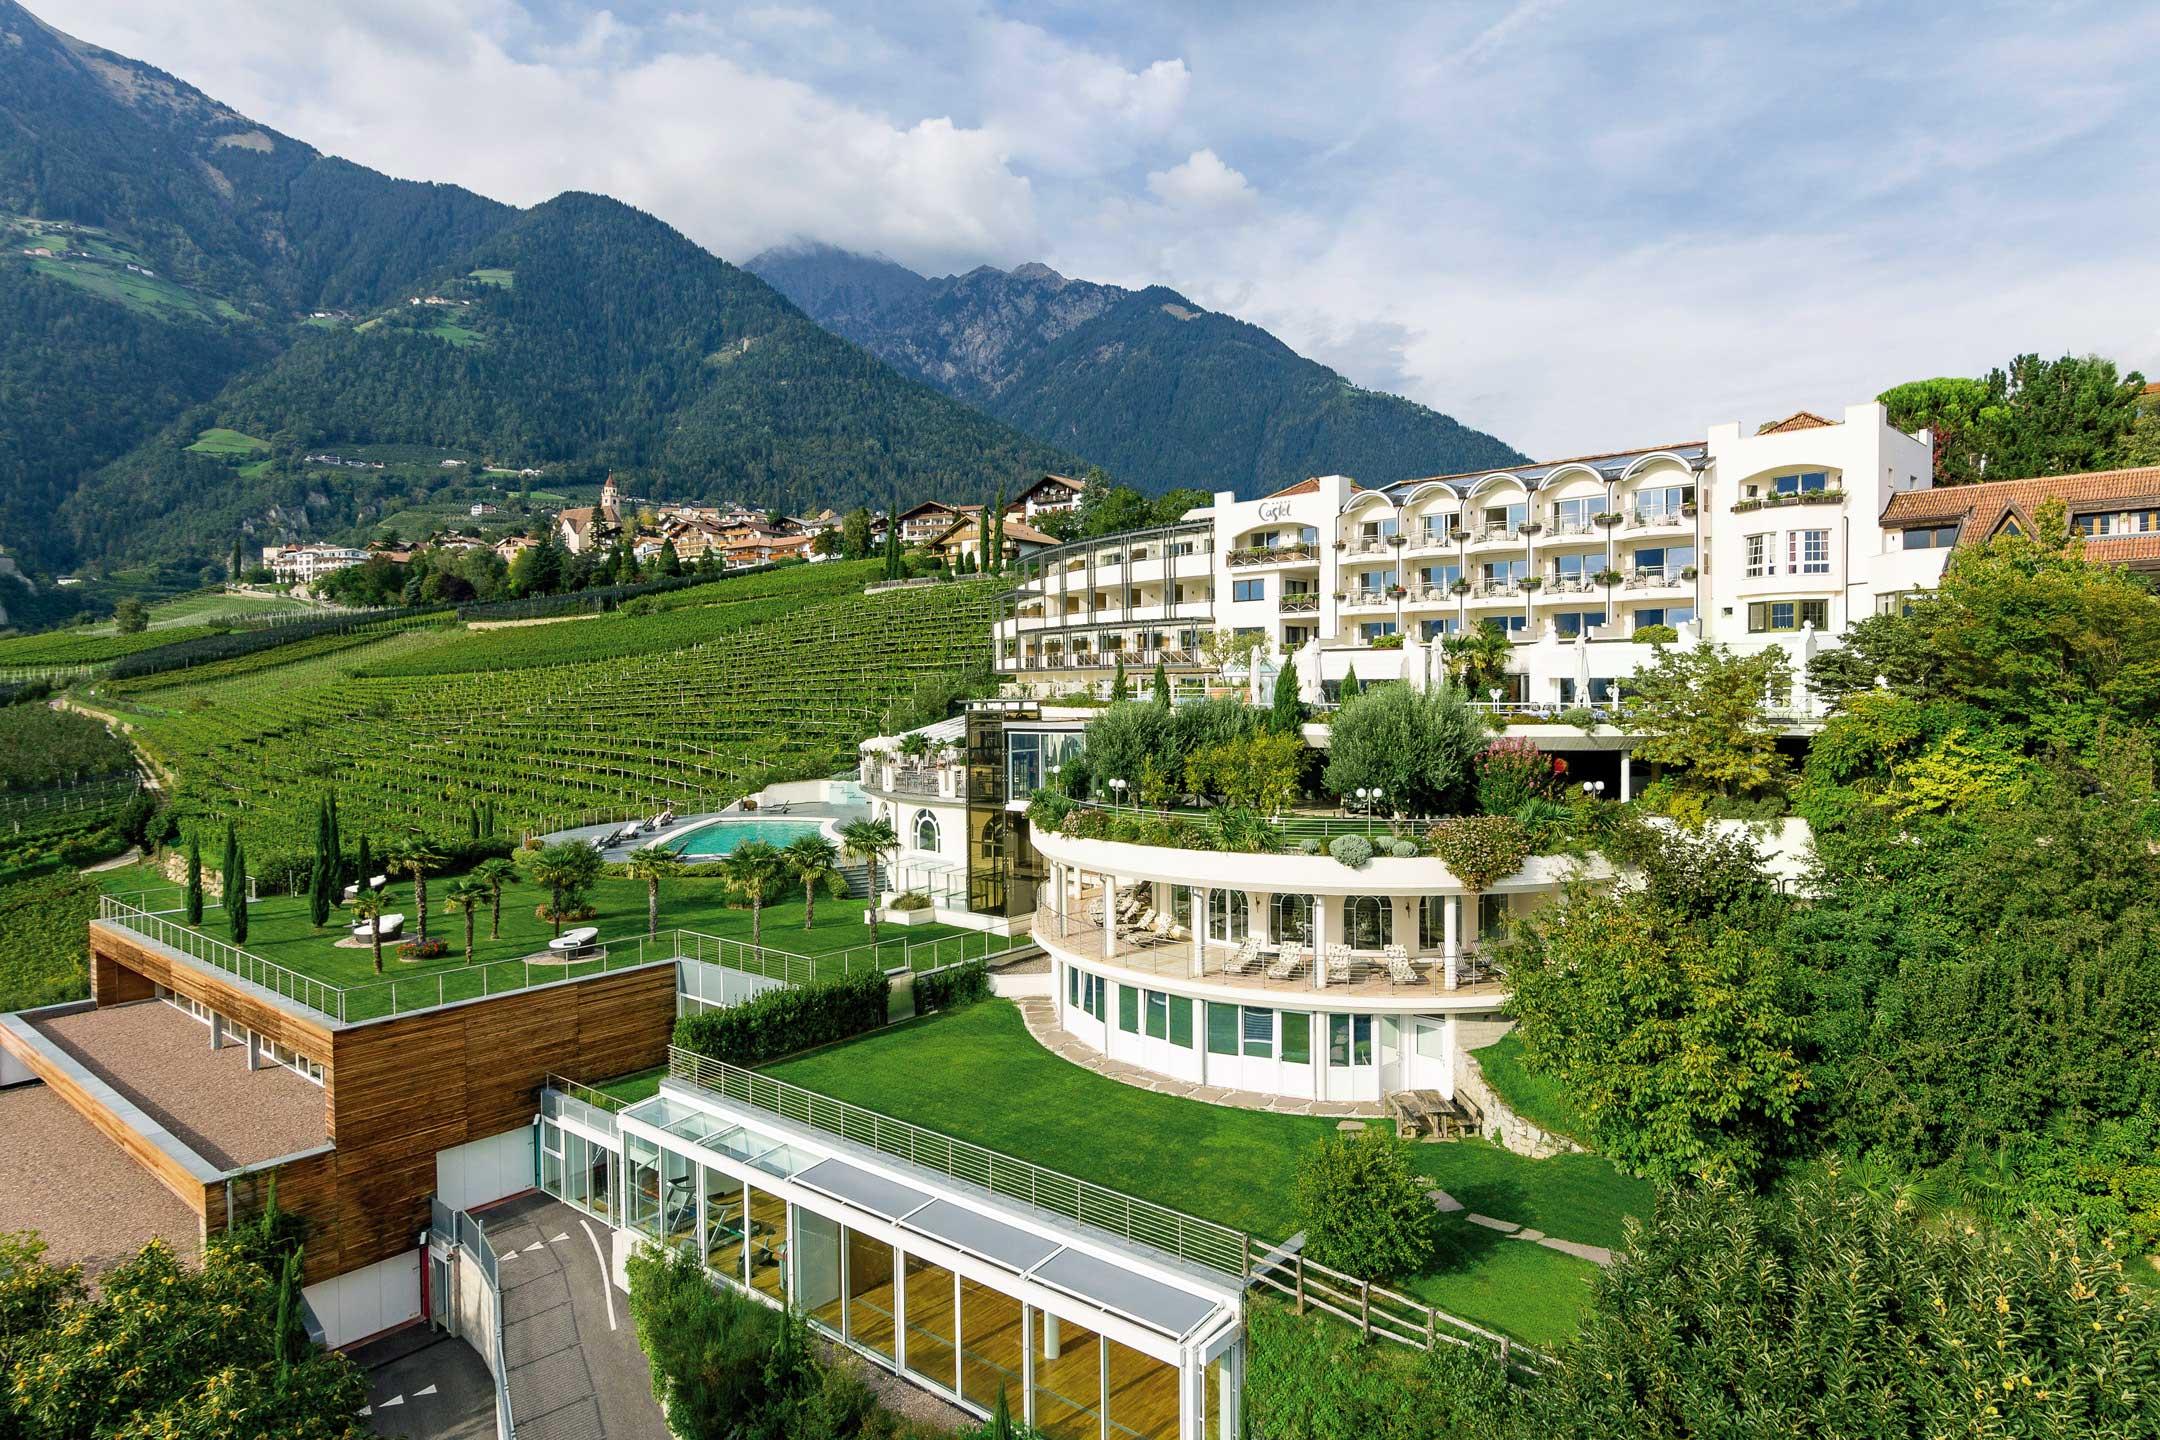 Hotel Castel, Dorf Tirol